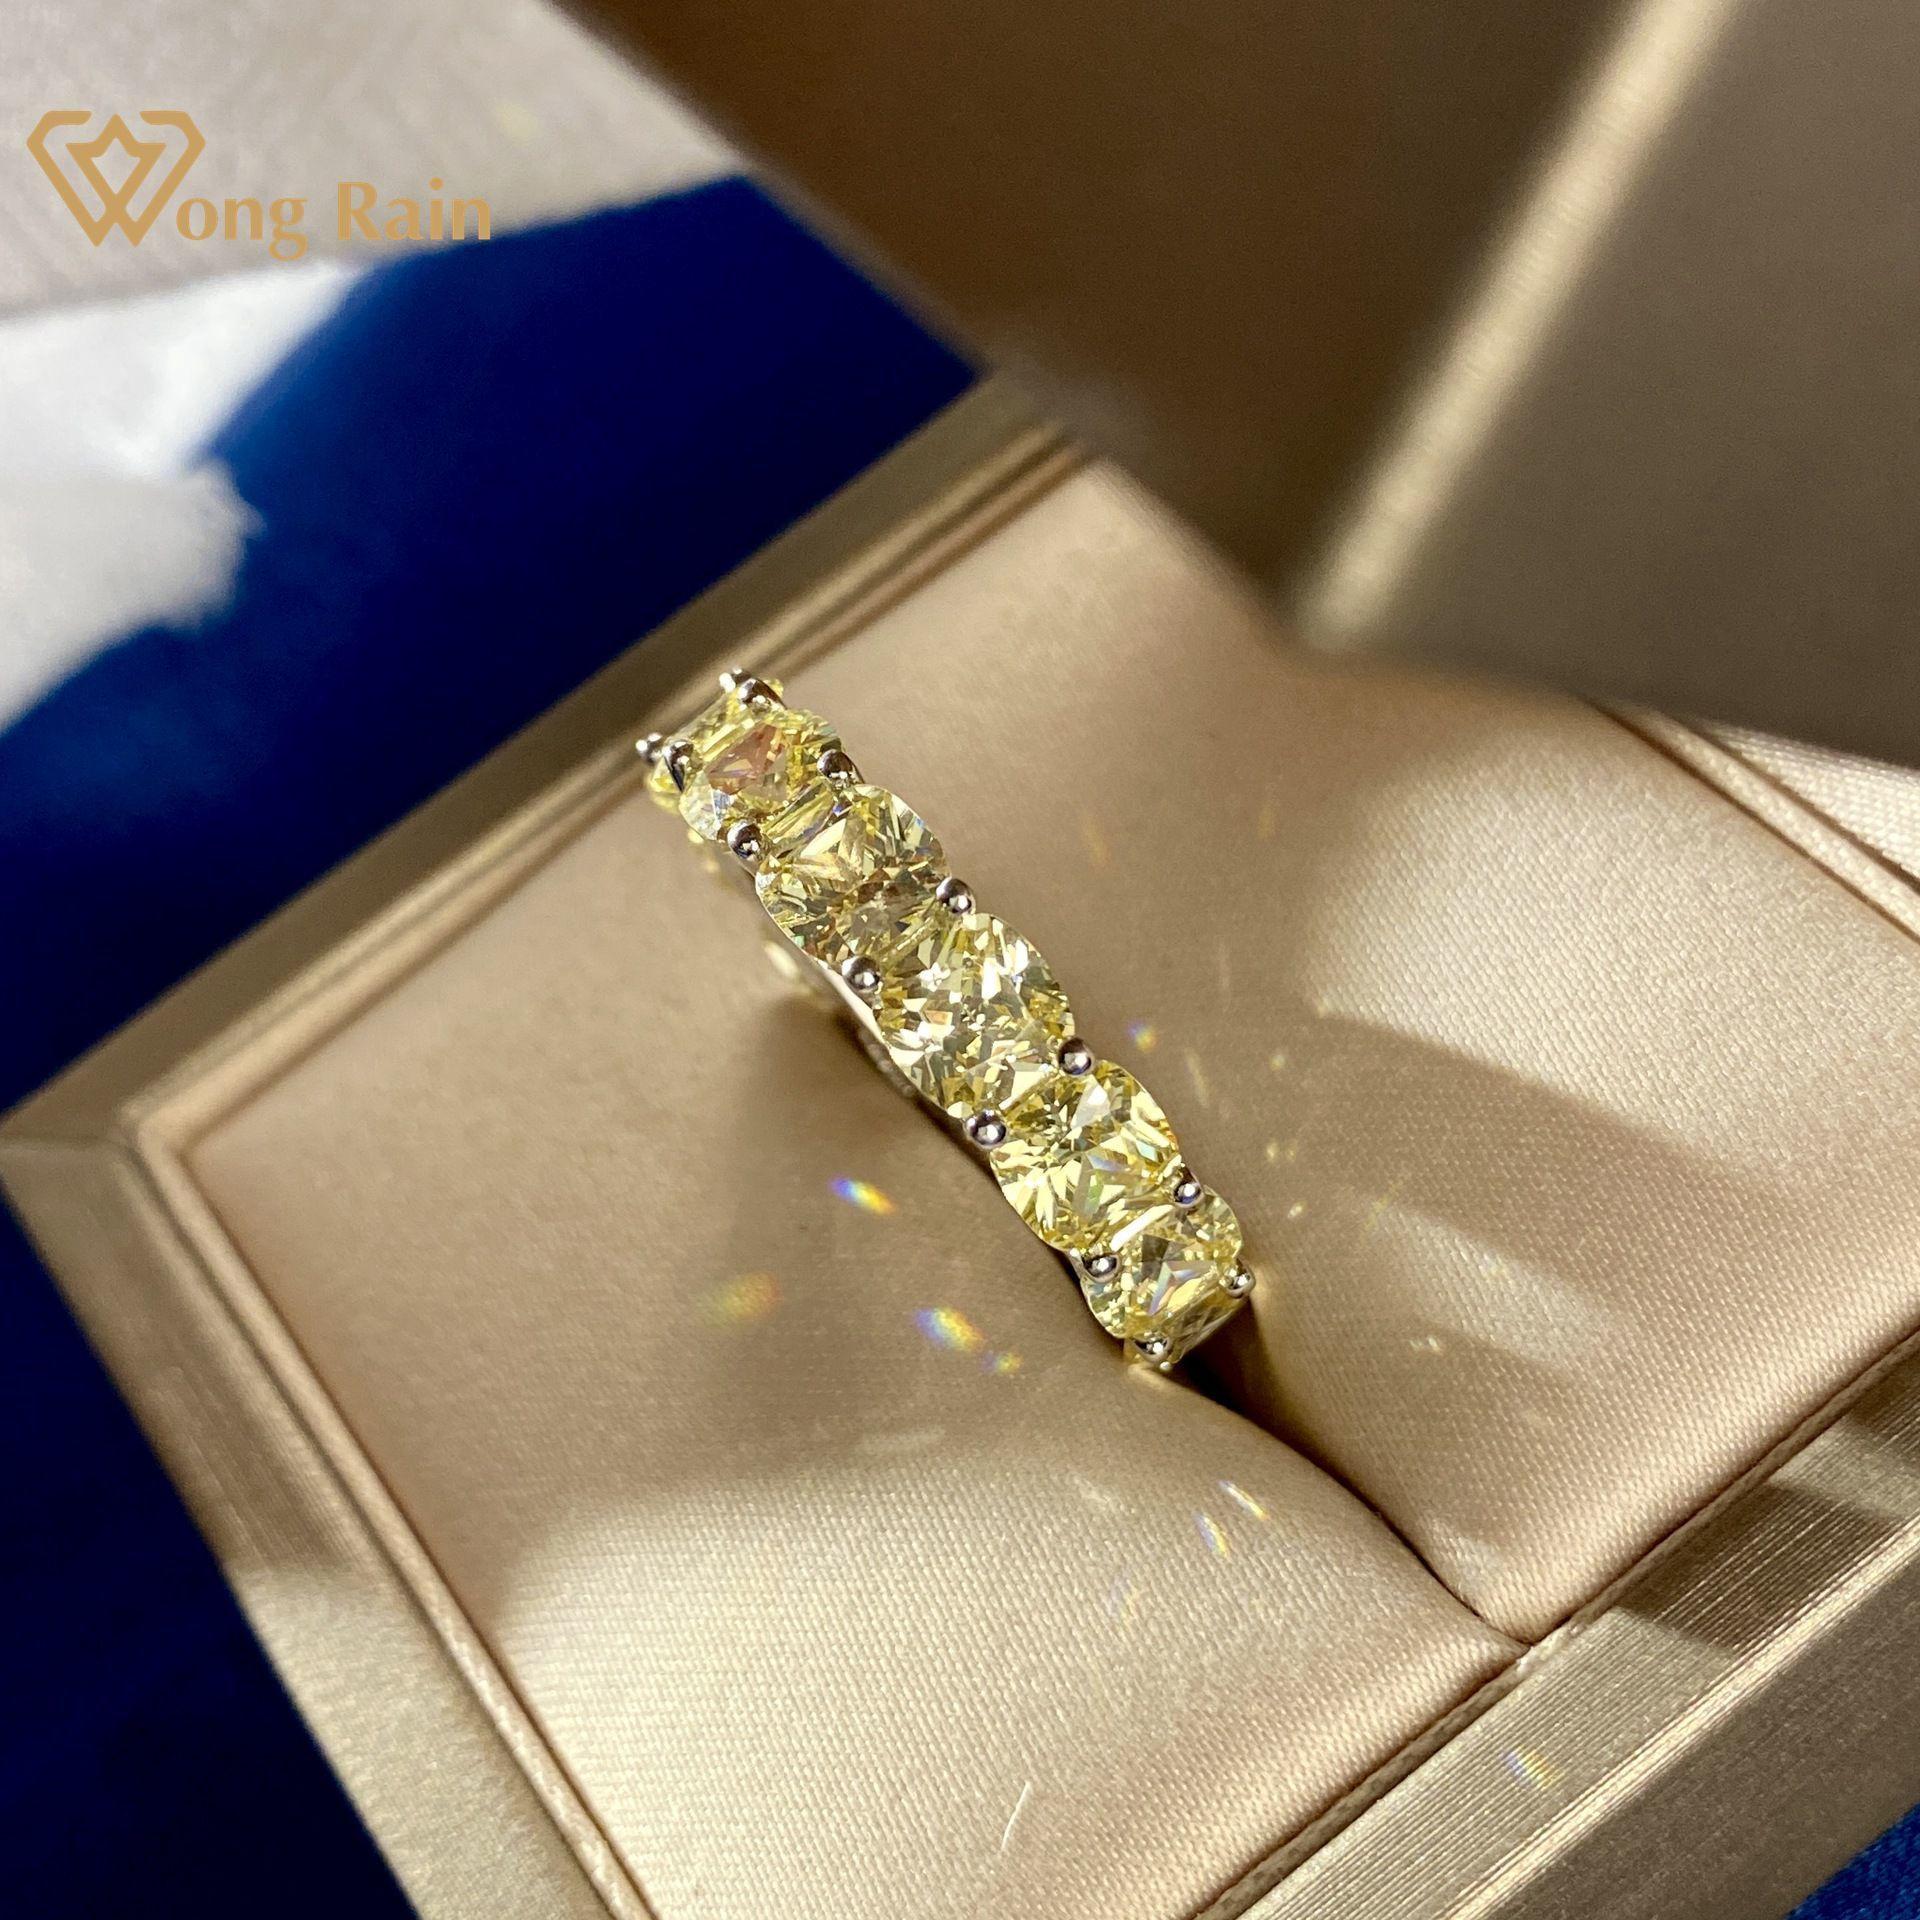 Wong Yağmur 925 Ayar Gümüş Sarı Oluşturulan Mozanit Elmas Taş Düğün Band Nişan Yüzüğü Güzel Takı Toptan Y0122